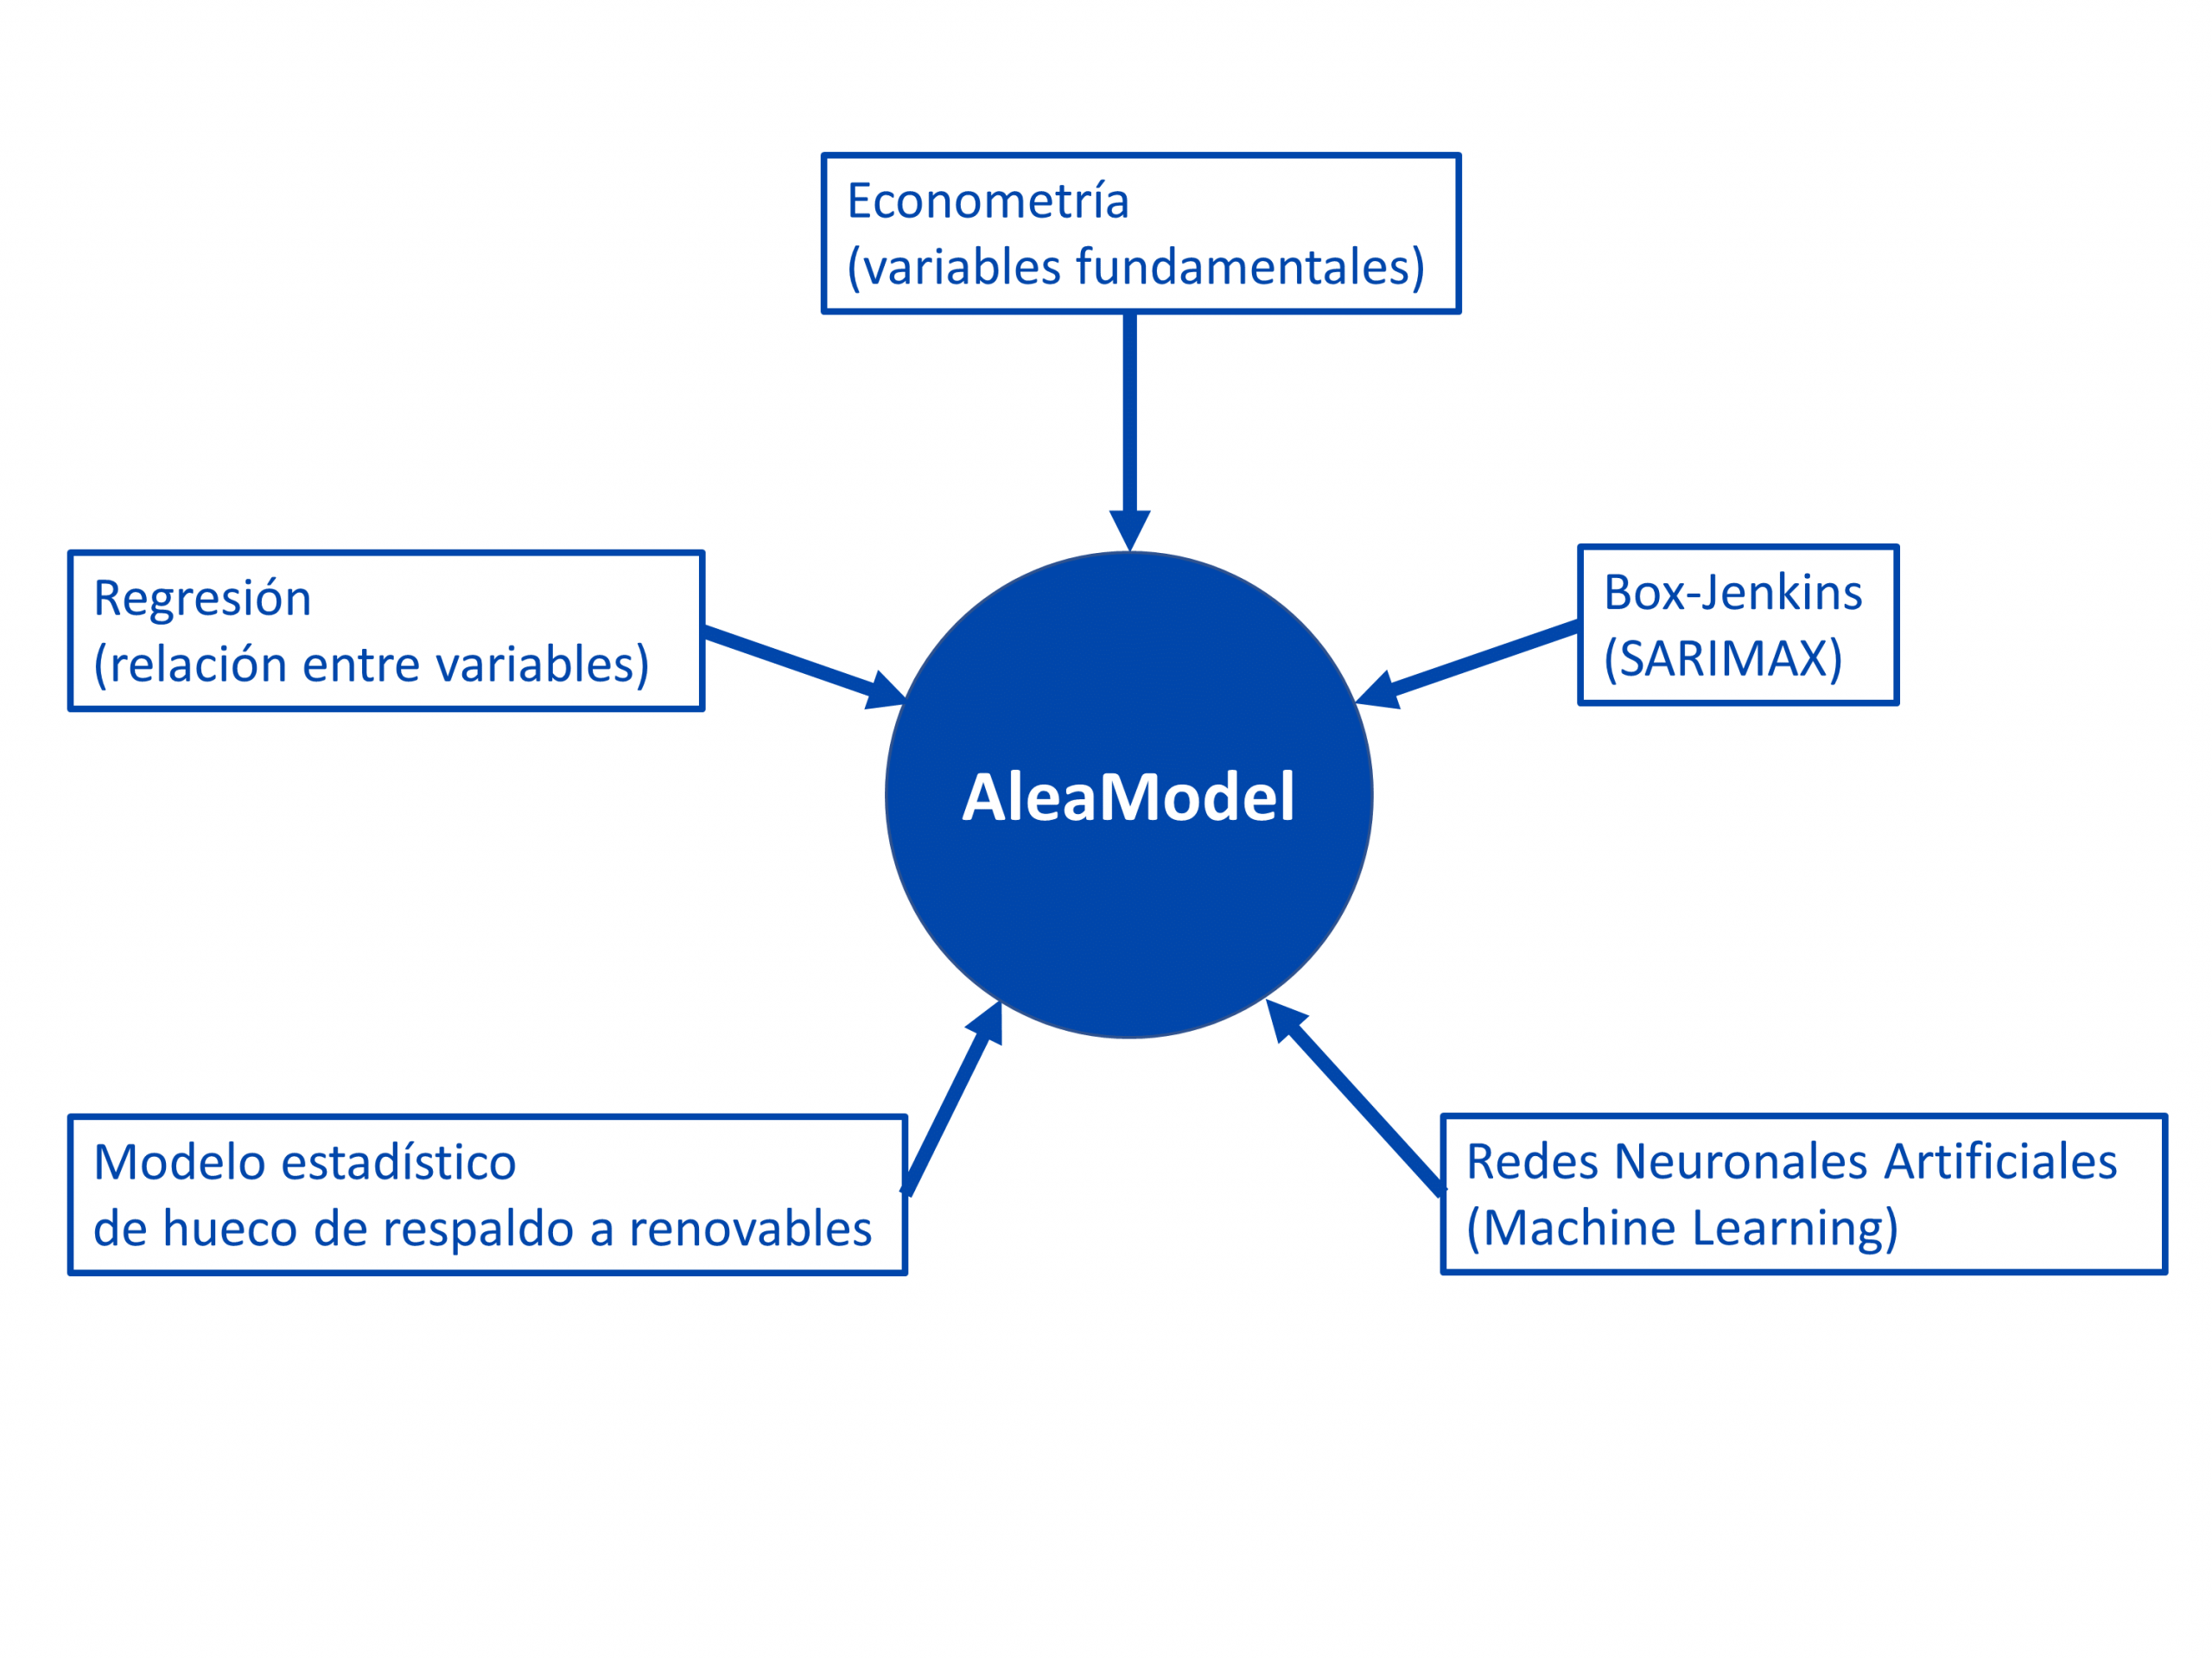 AleaSoft - Modelos variables técnicas AleaModel